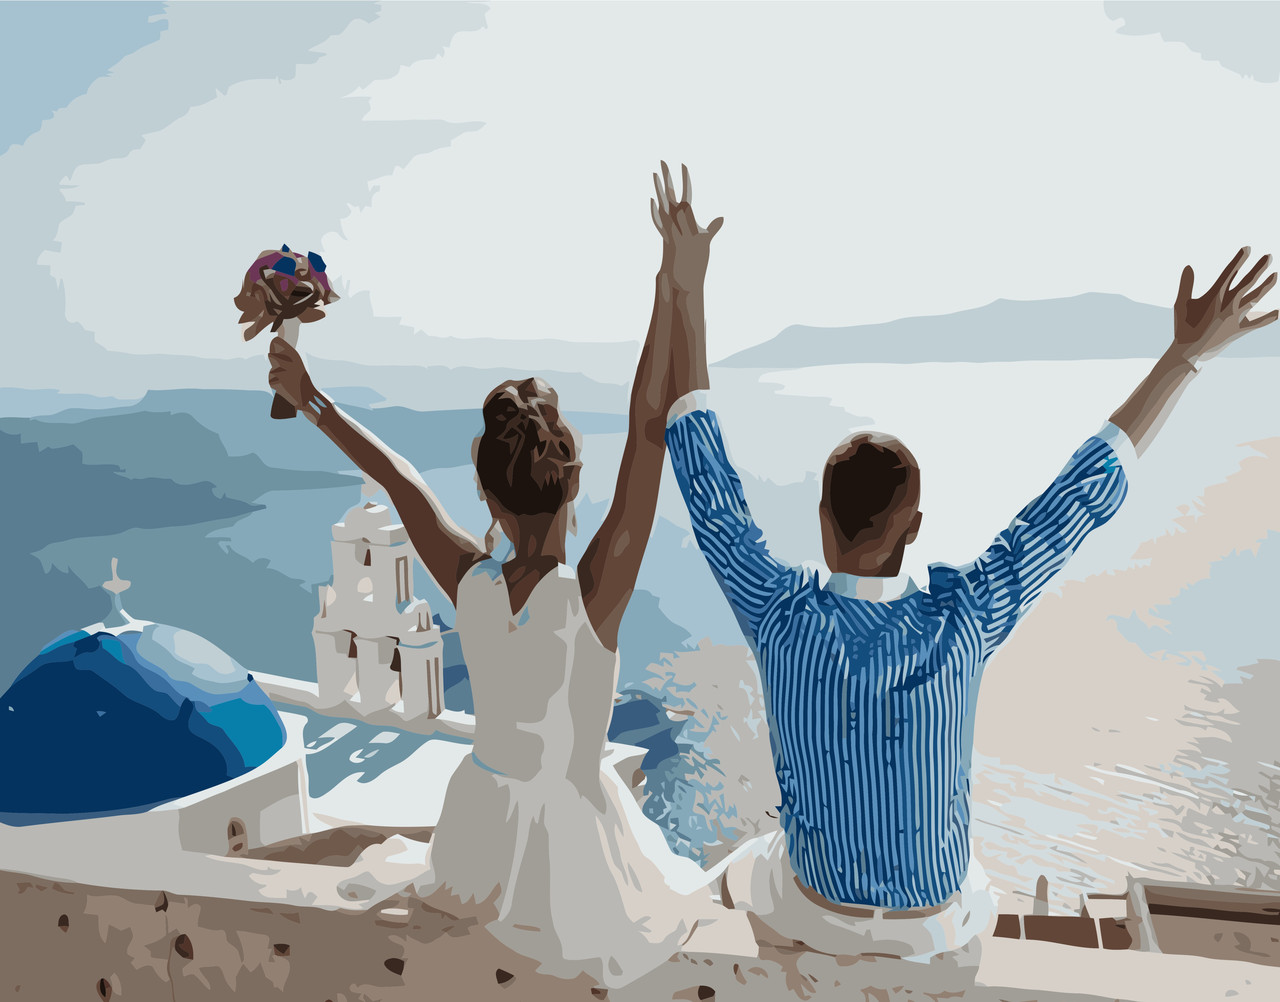 Картина по номерам VA-1090 Свадебное путешествие, 40х50см. Strateg